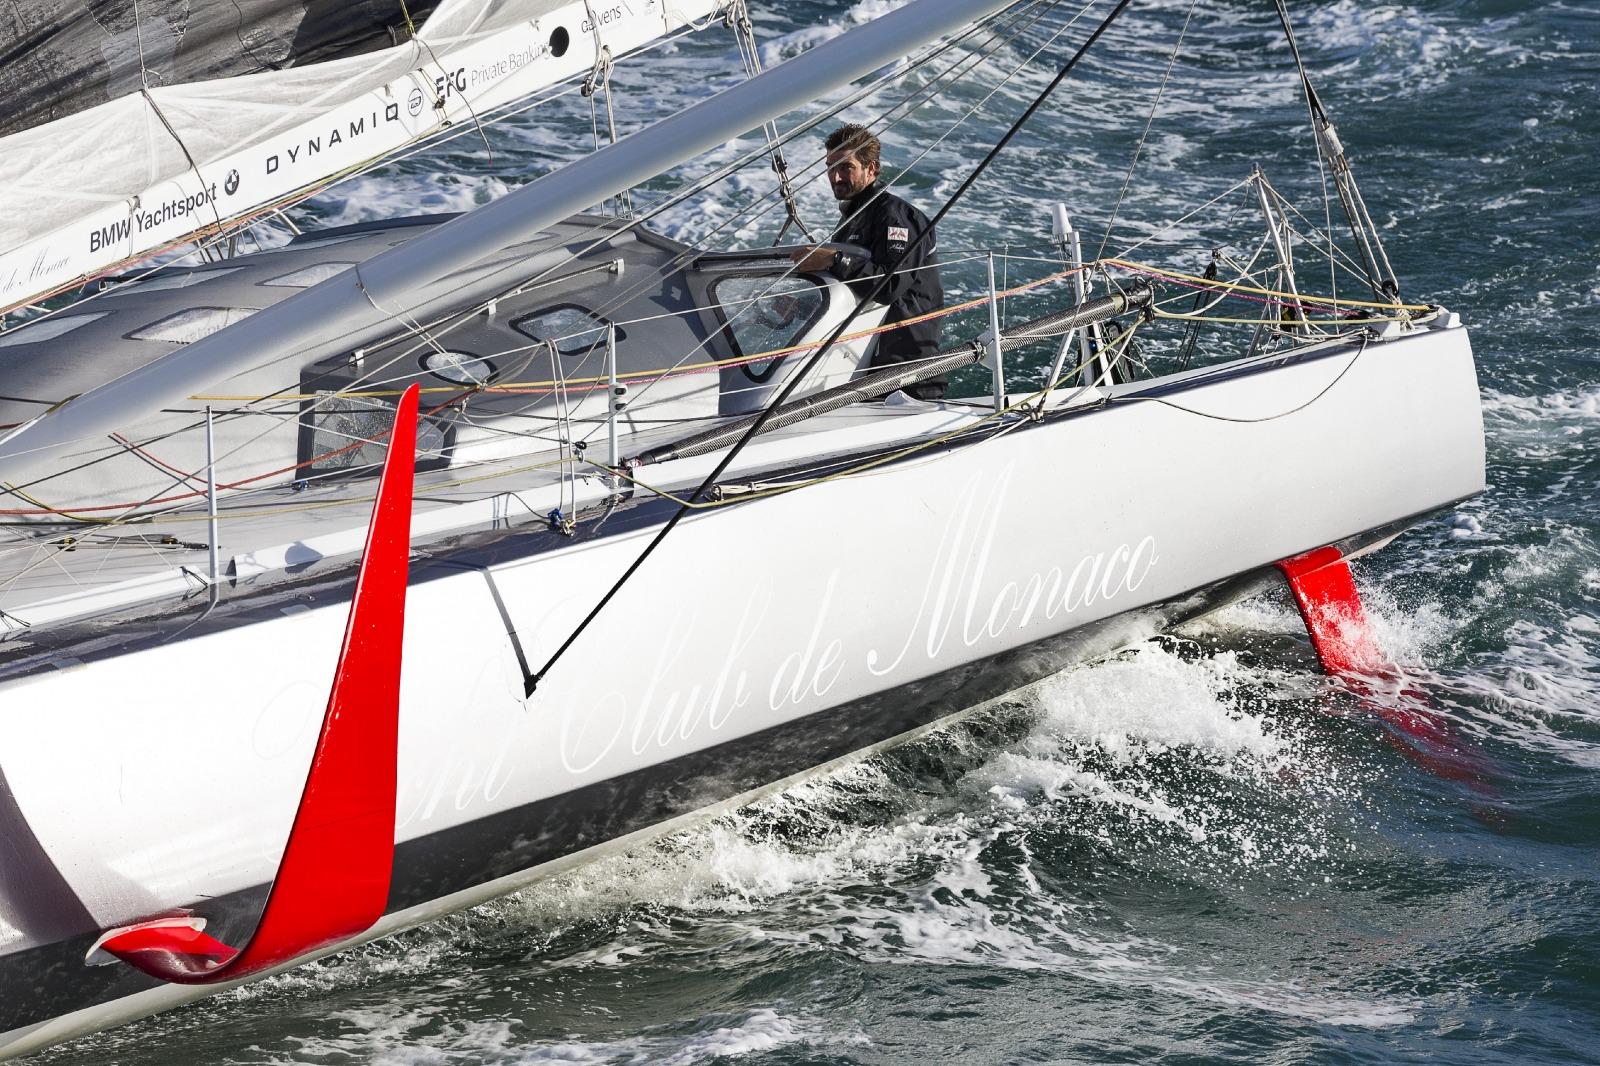 transat jacques vabre 2017 gitana leads catamaran racing news design